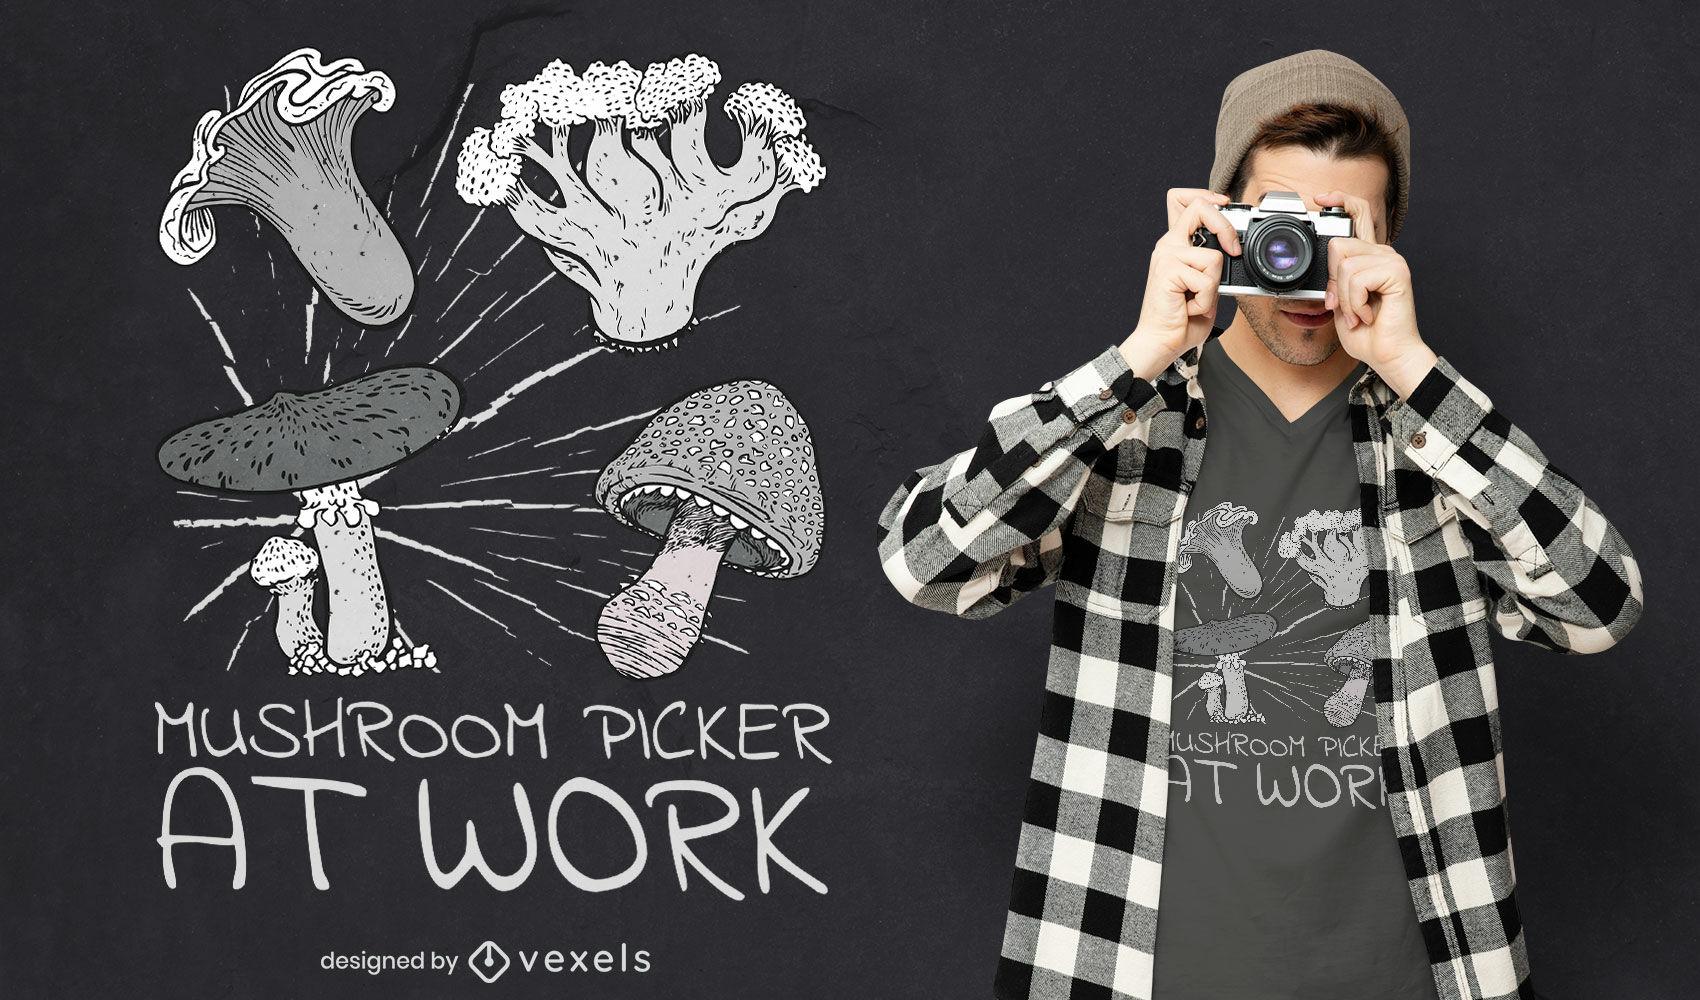 Mushroom picking quote t-shirt design